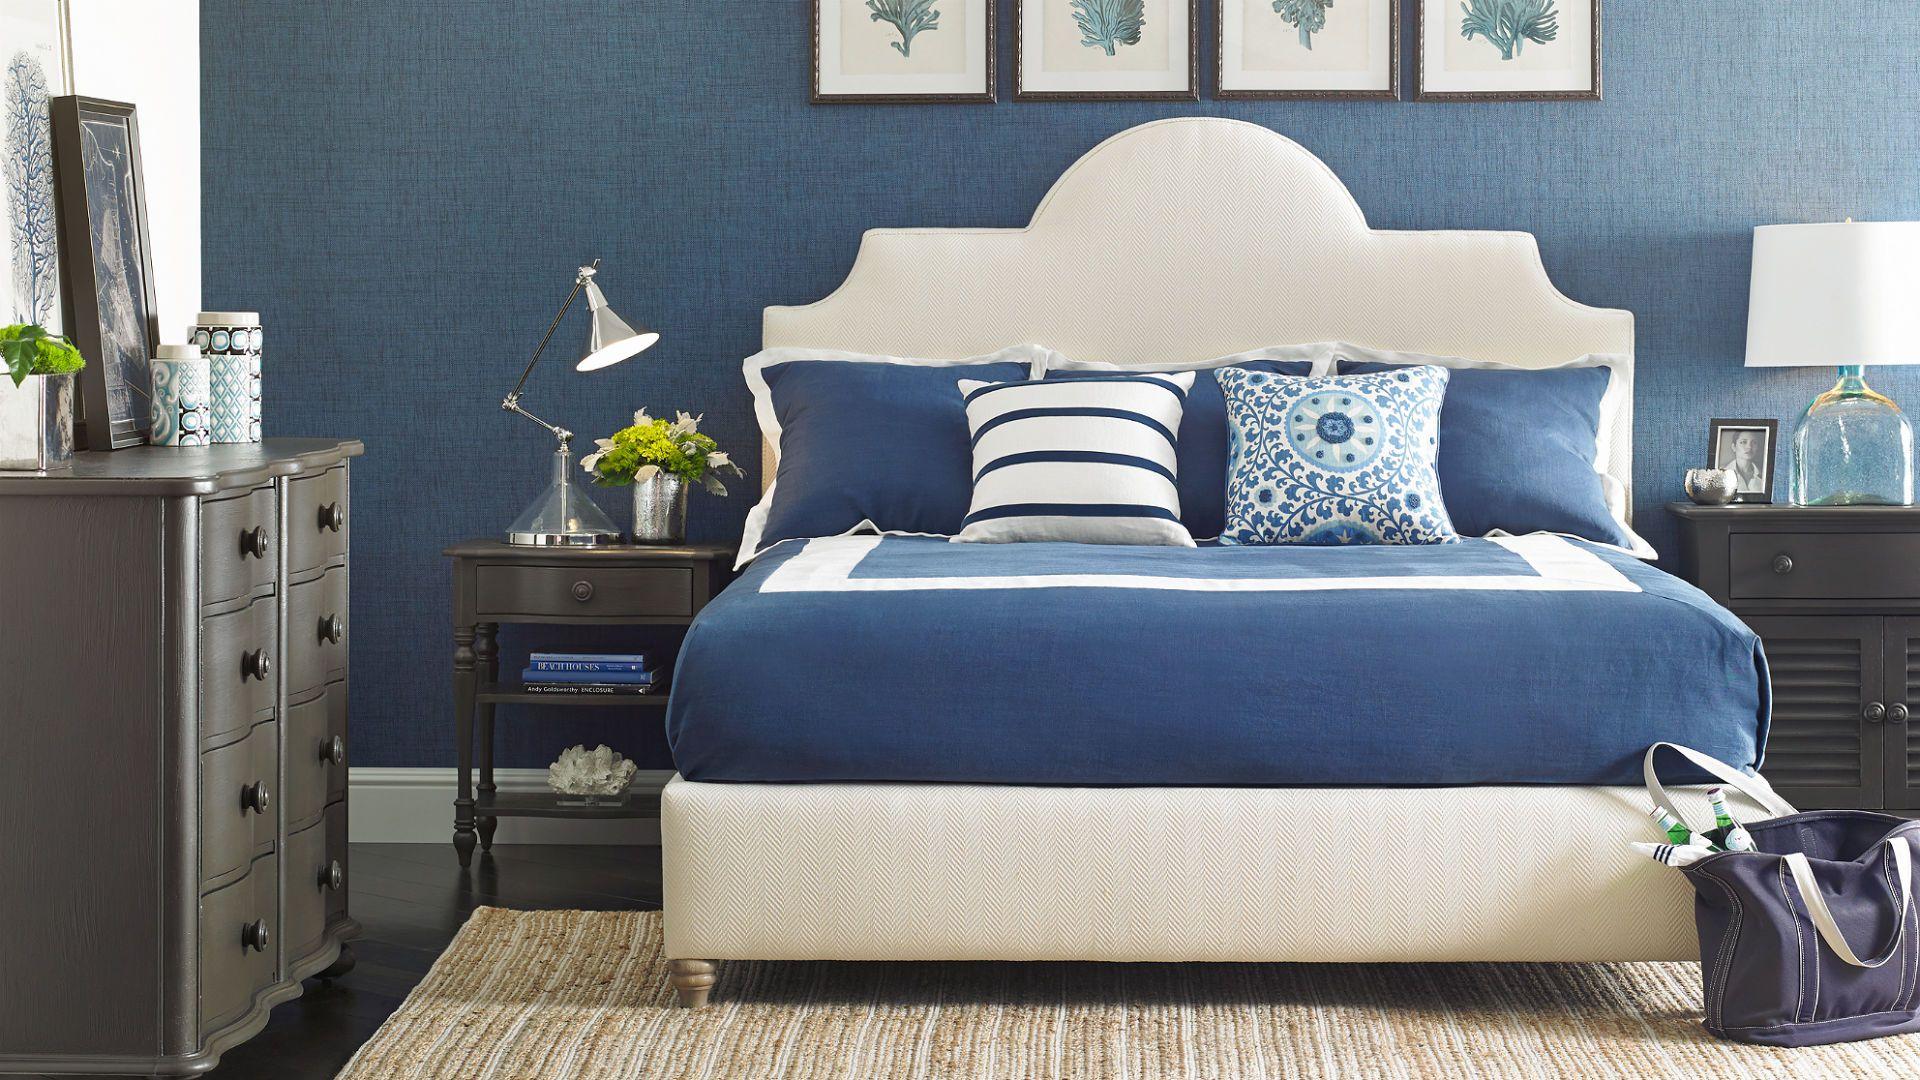 Stanley Coastal Bedroom Furniture in 2020 Coastal